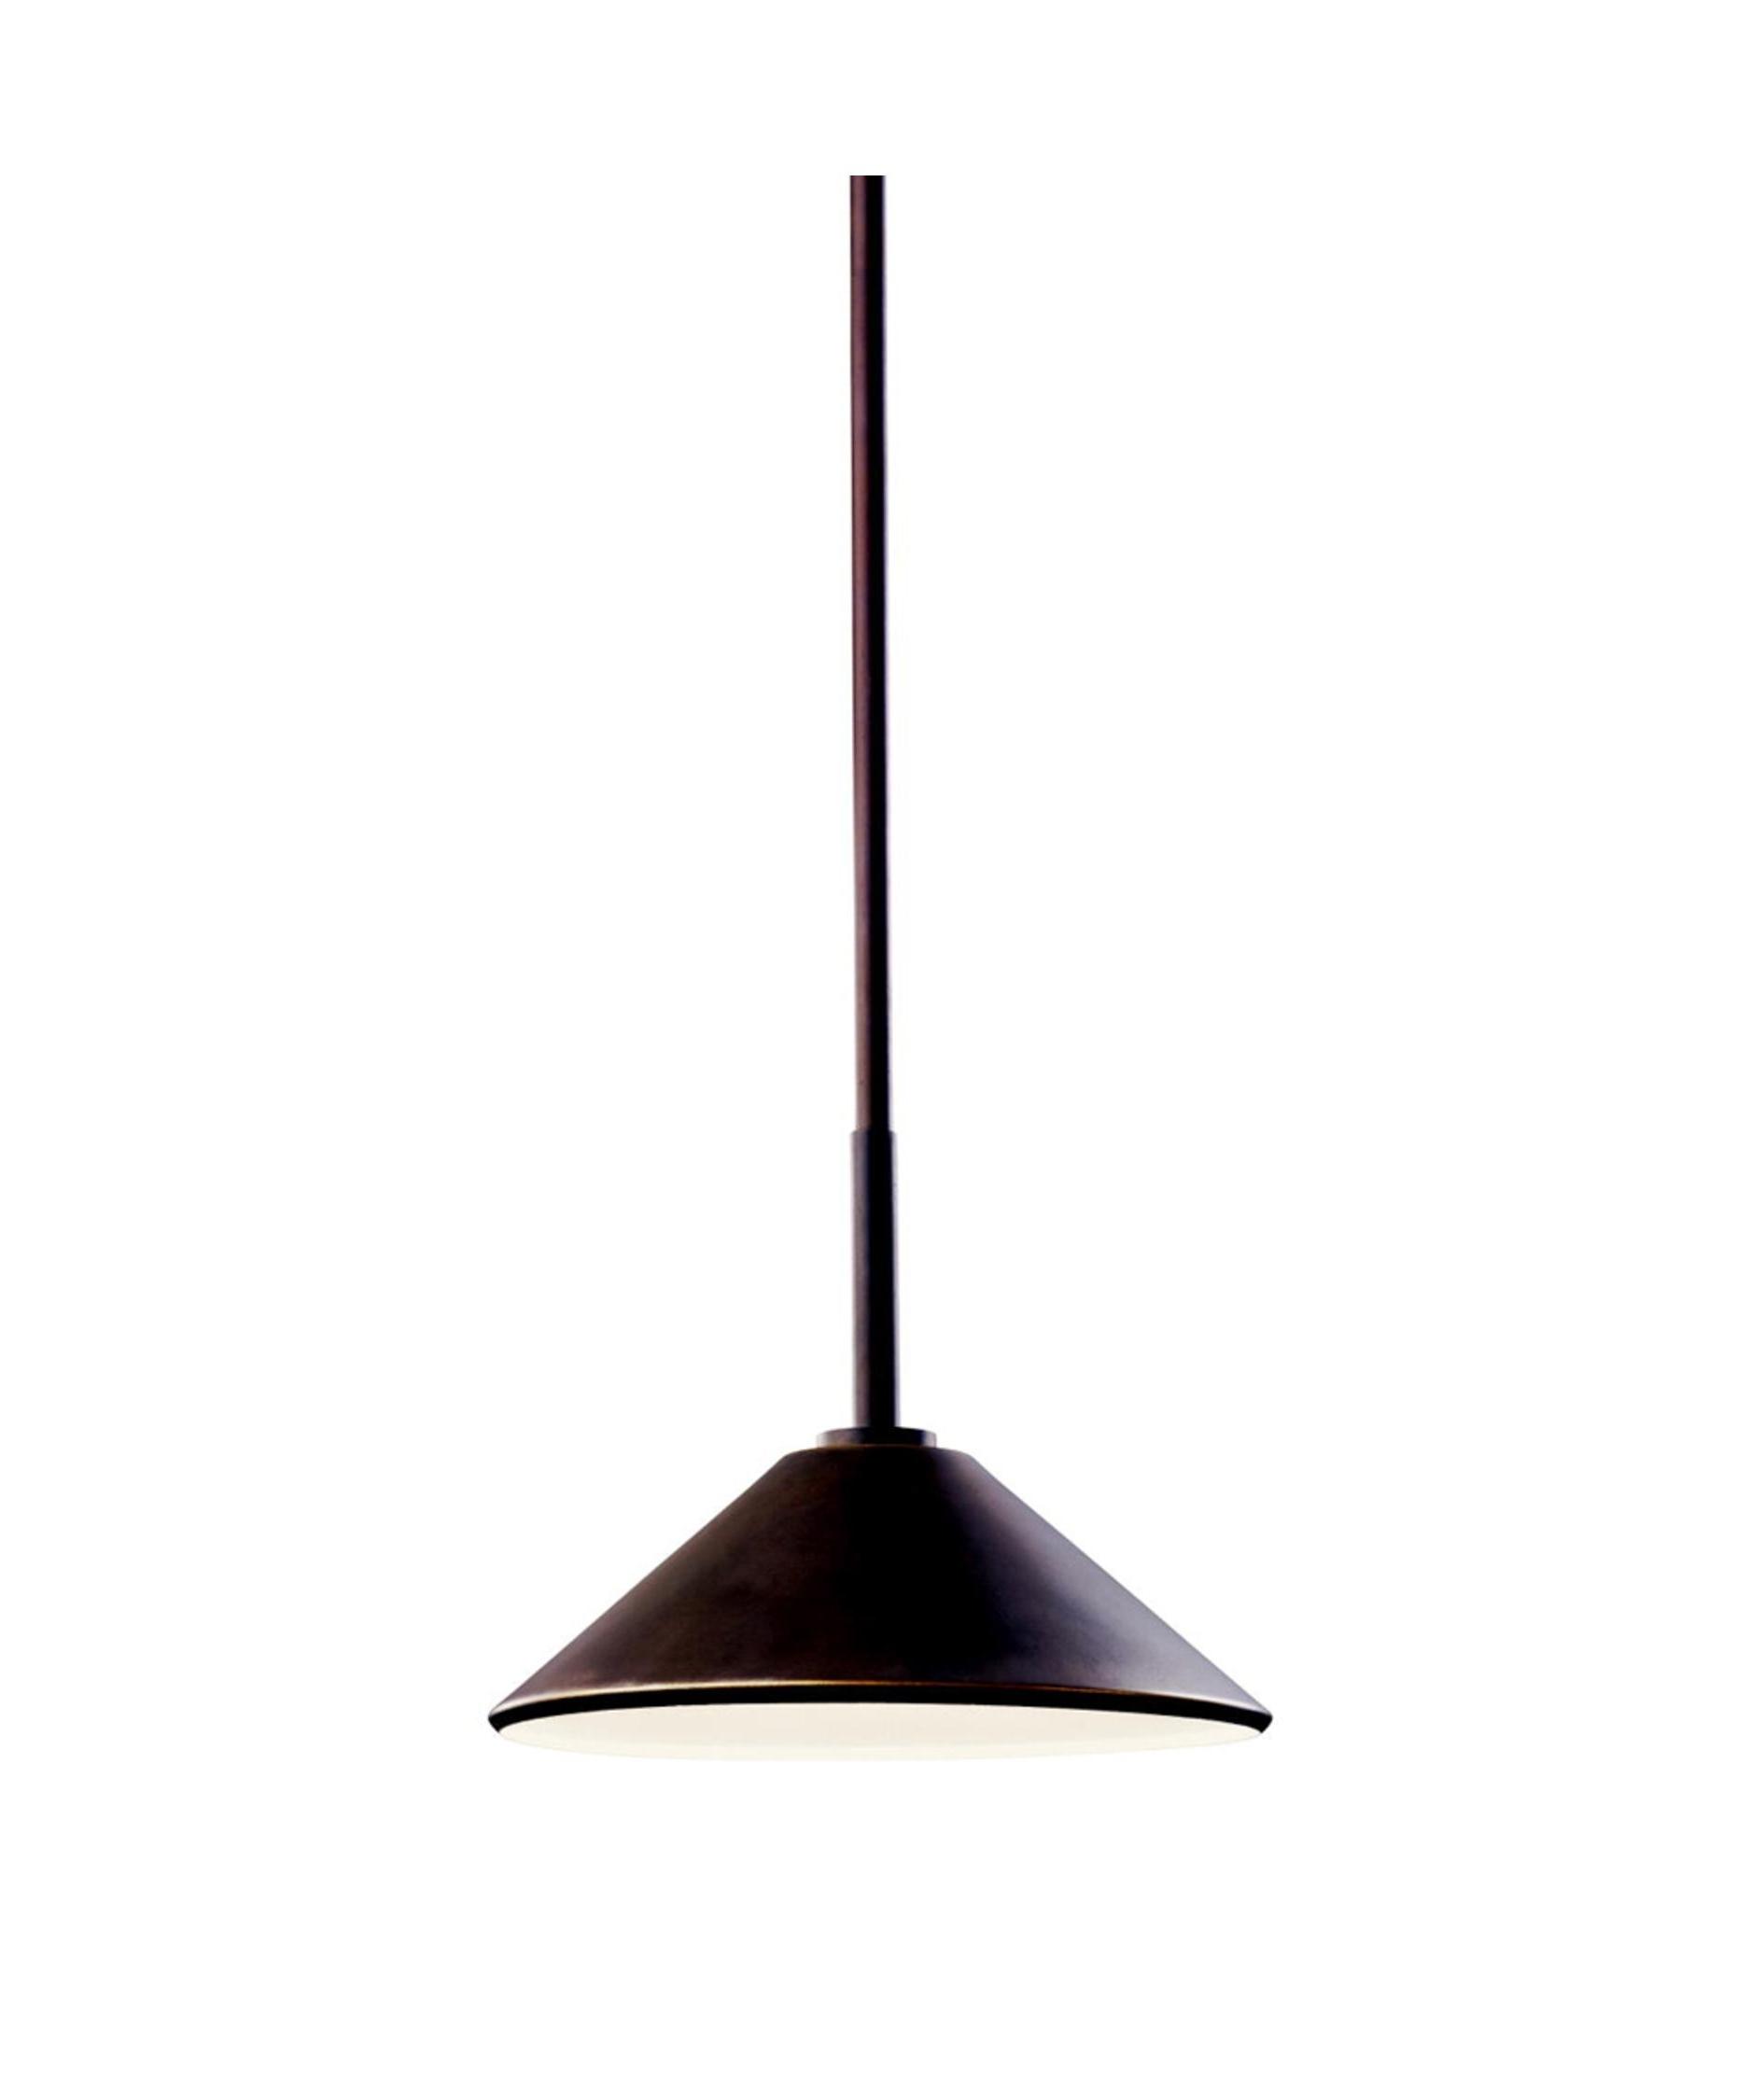 Popular Kichler Outdoor Hanging Lights Regarding Kichler 49062 Ripley 10 Inch Wide 1 Light Outdoor Hanging Lantern (View 15 of 20)